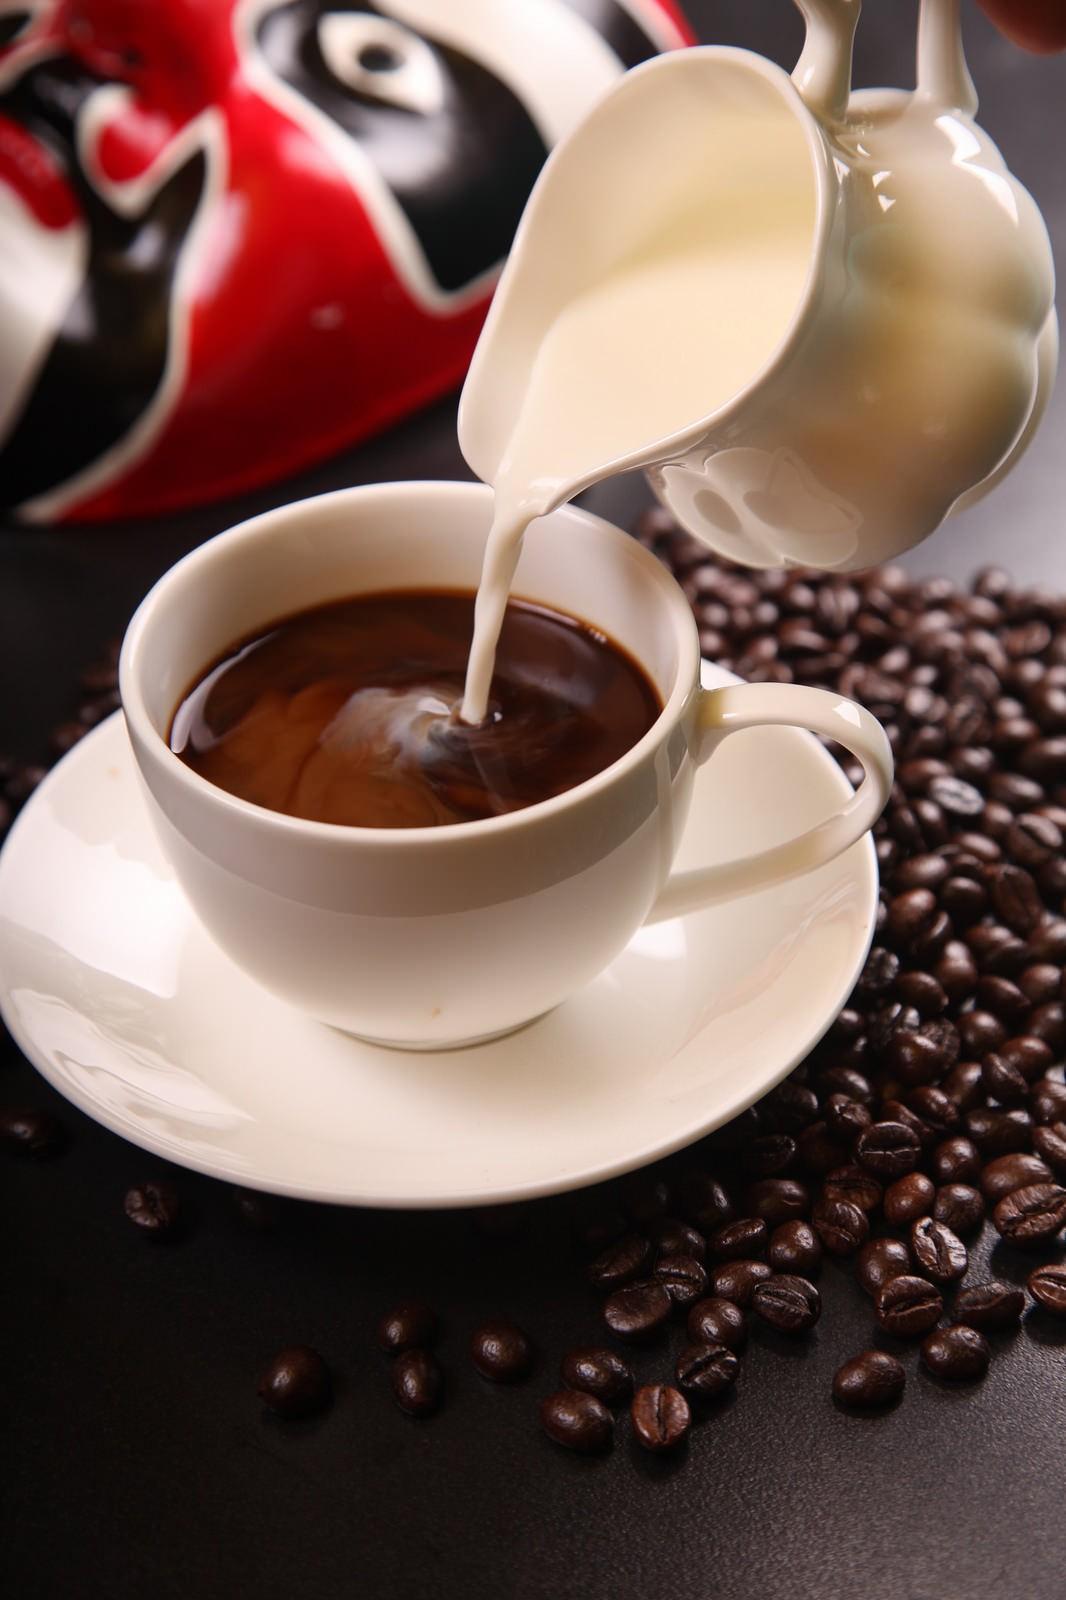 Марта, картинки кофейное утро